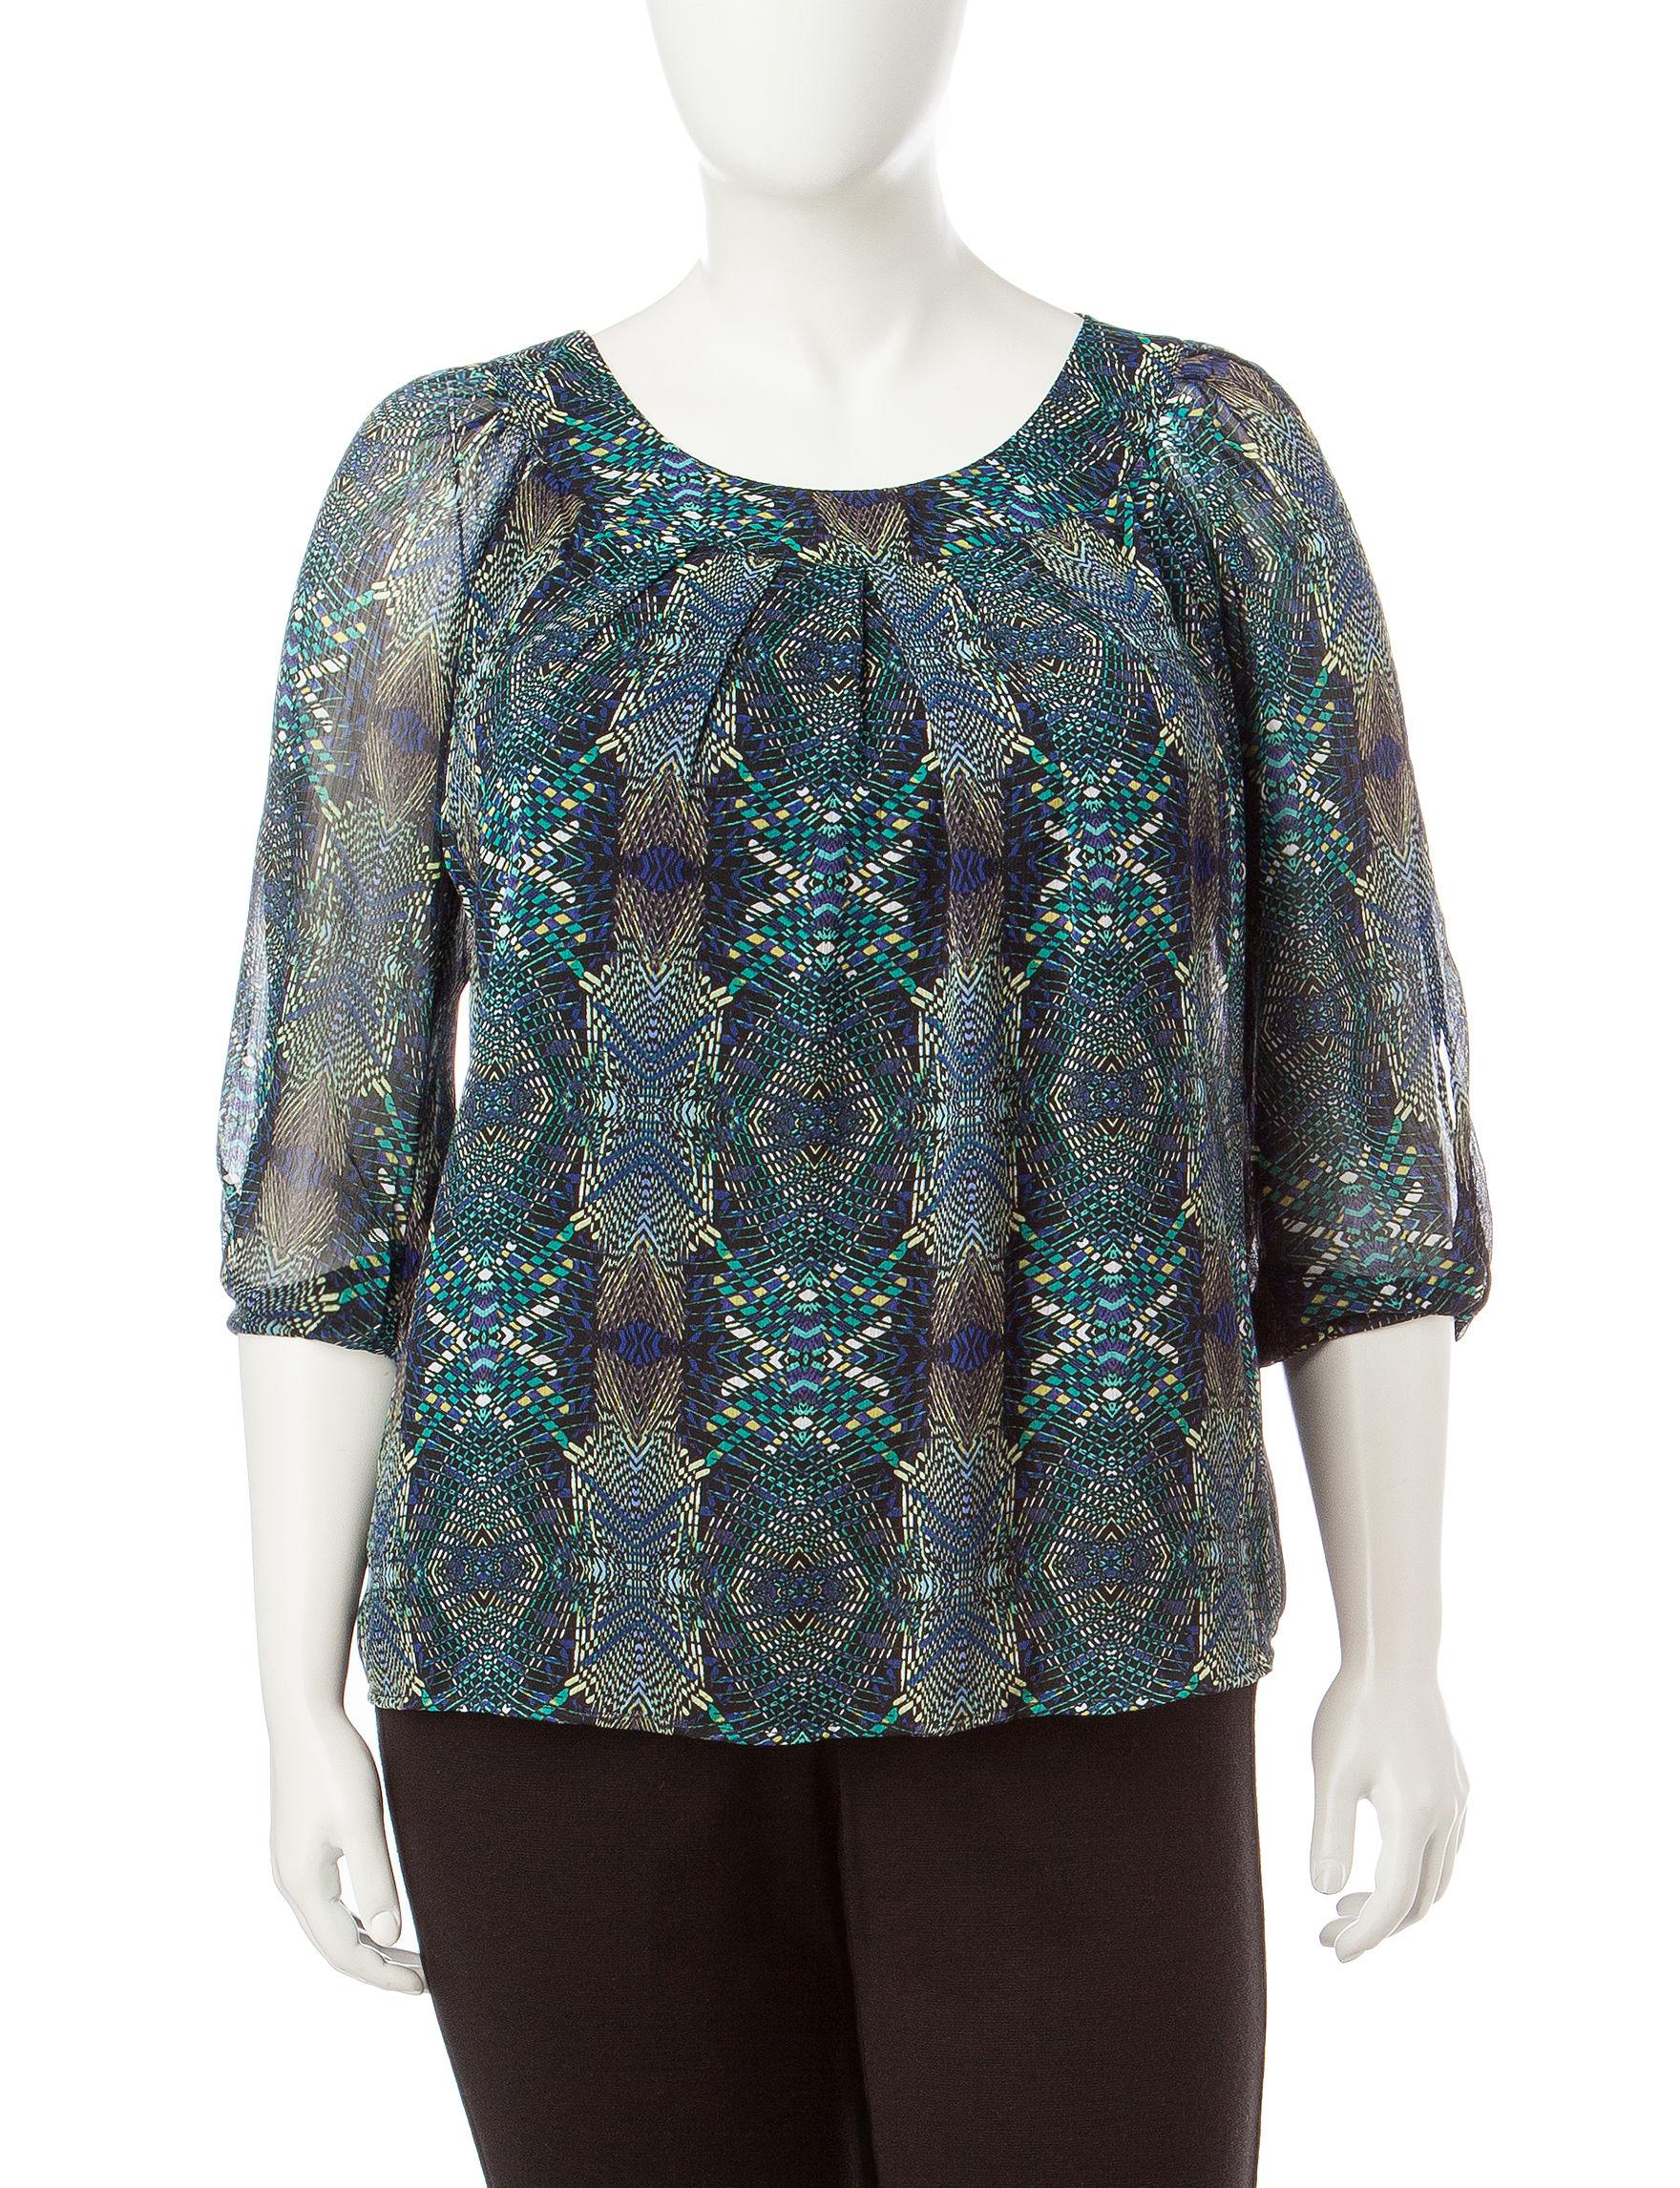 Rebecca Malone Teal Shirts & Blouses